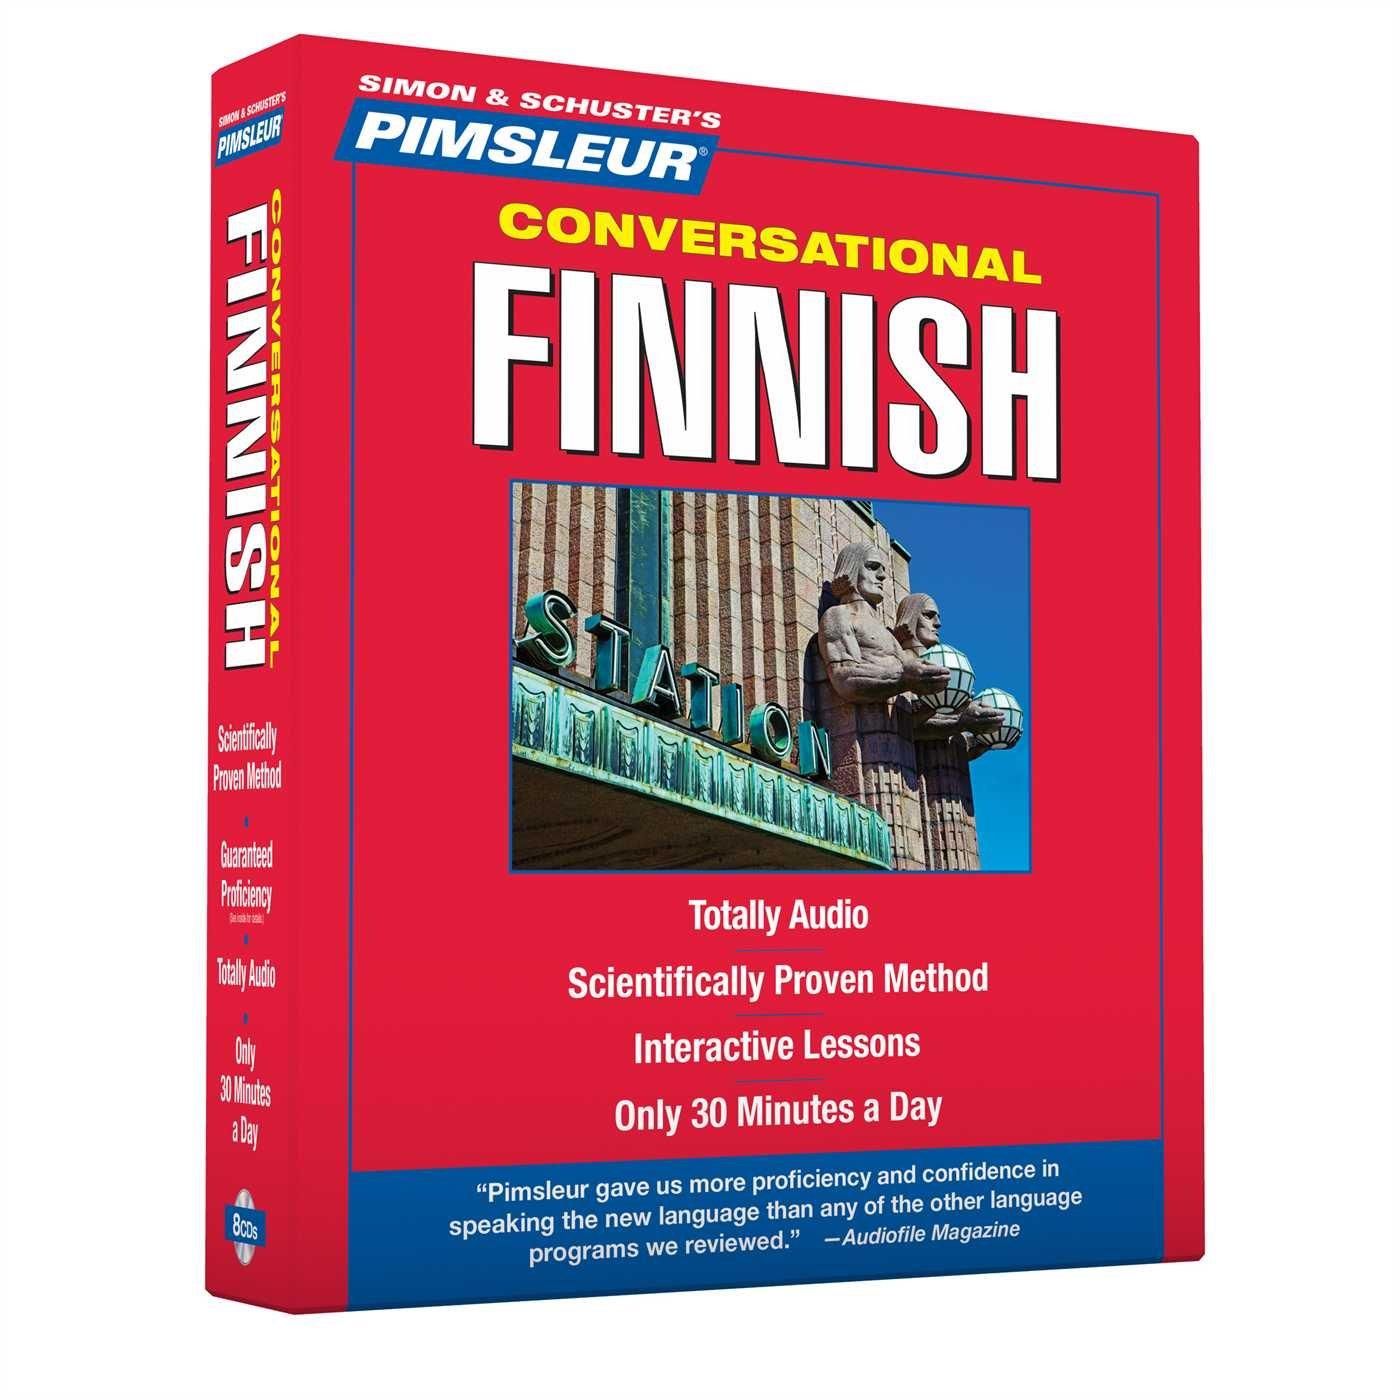 Pimsleur Conversational Finnish